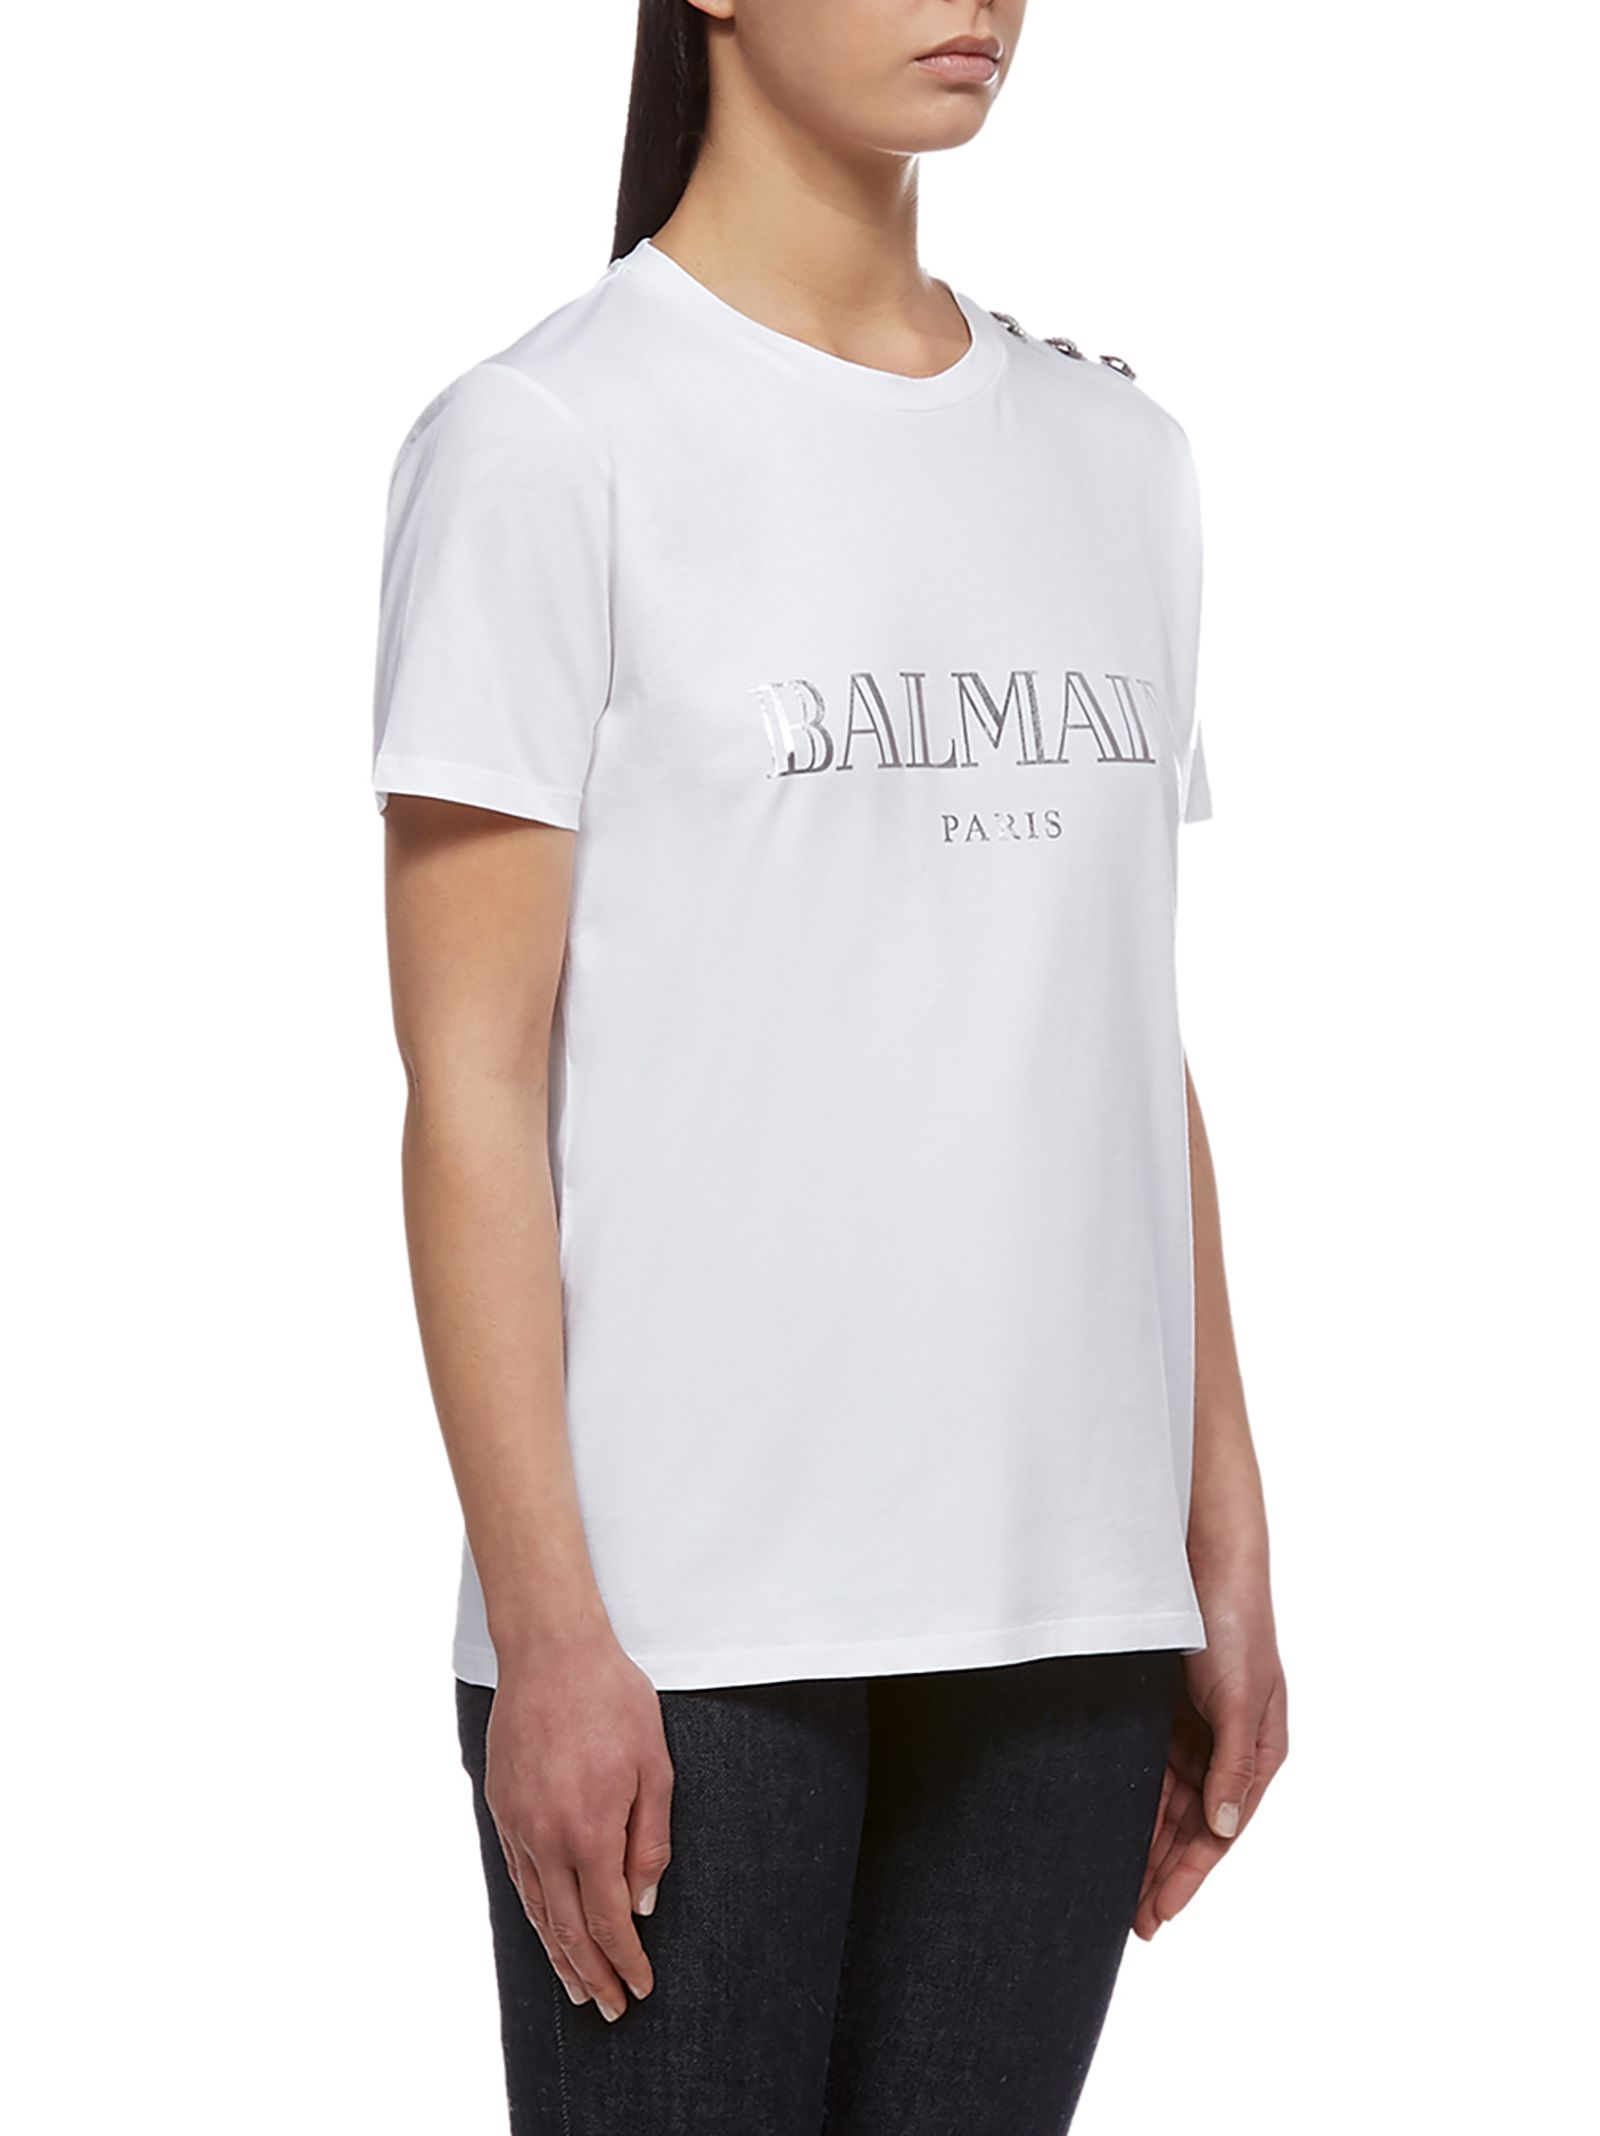 cbd39984c Balmain Balmain Short Sleeve T-Shirt - Bianco argento - 10864974 ...